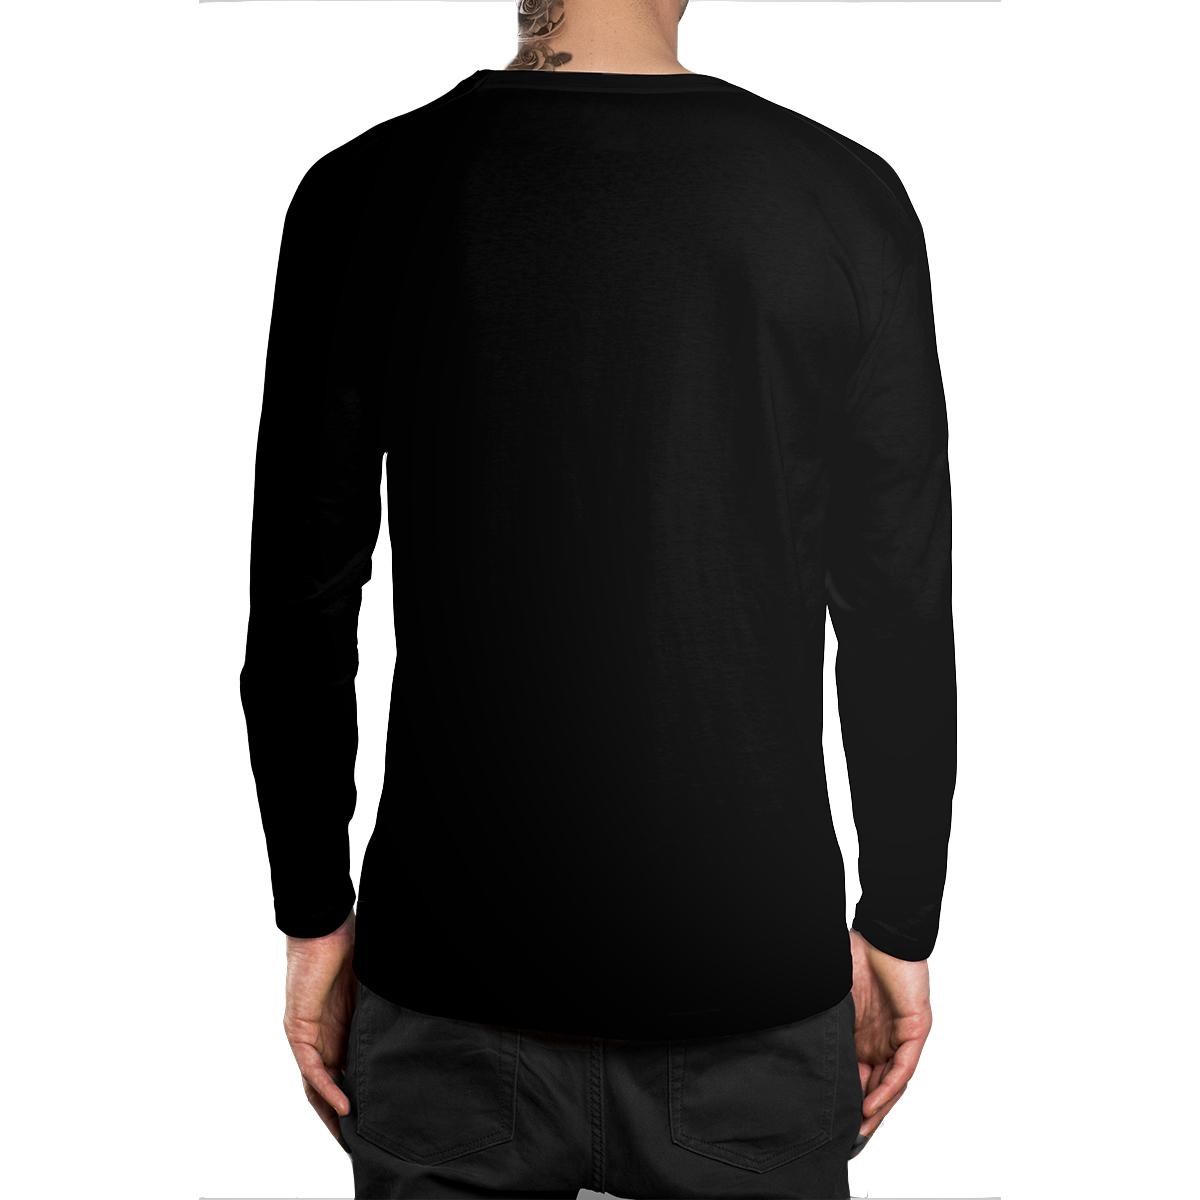 Stompy Camiseta Manga Longa Modelo 11